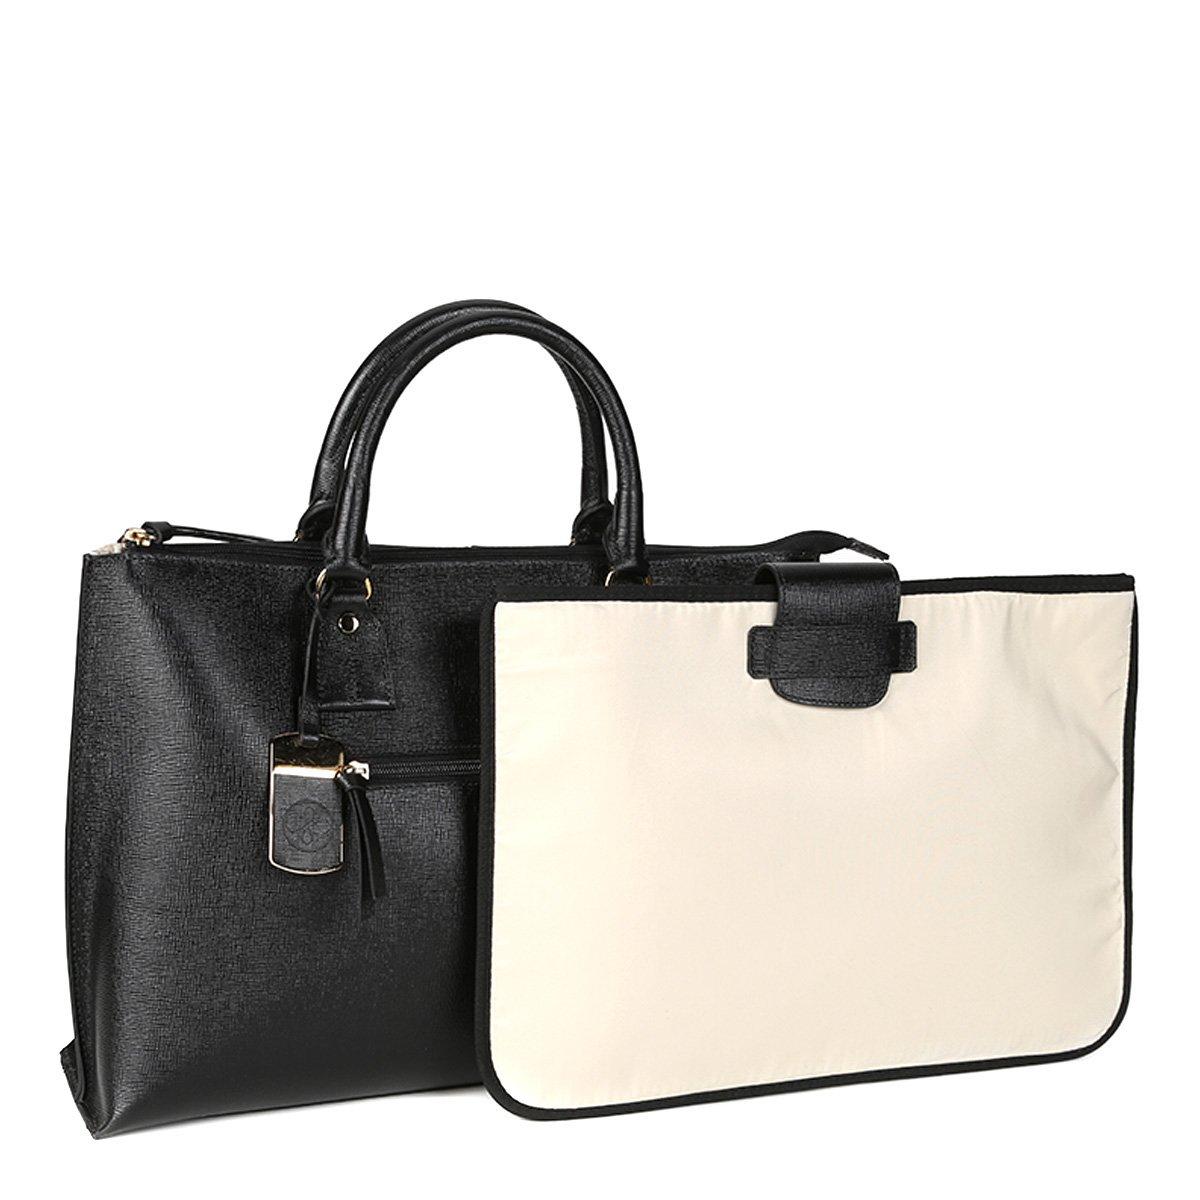 Bolsa Executiva Feminina Couro : Bolsa couro shoestock per executiva feminina preto